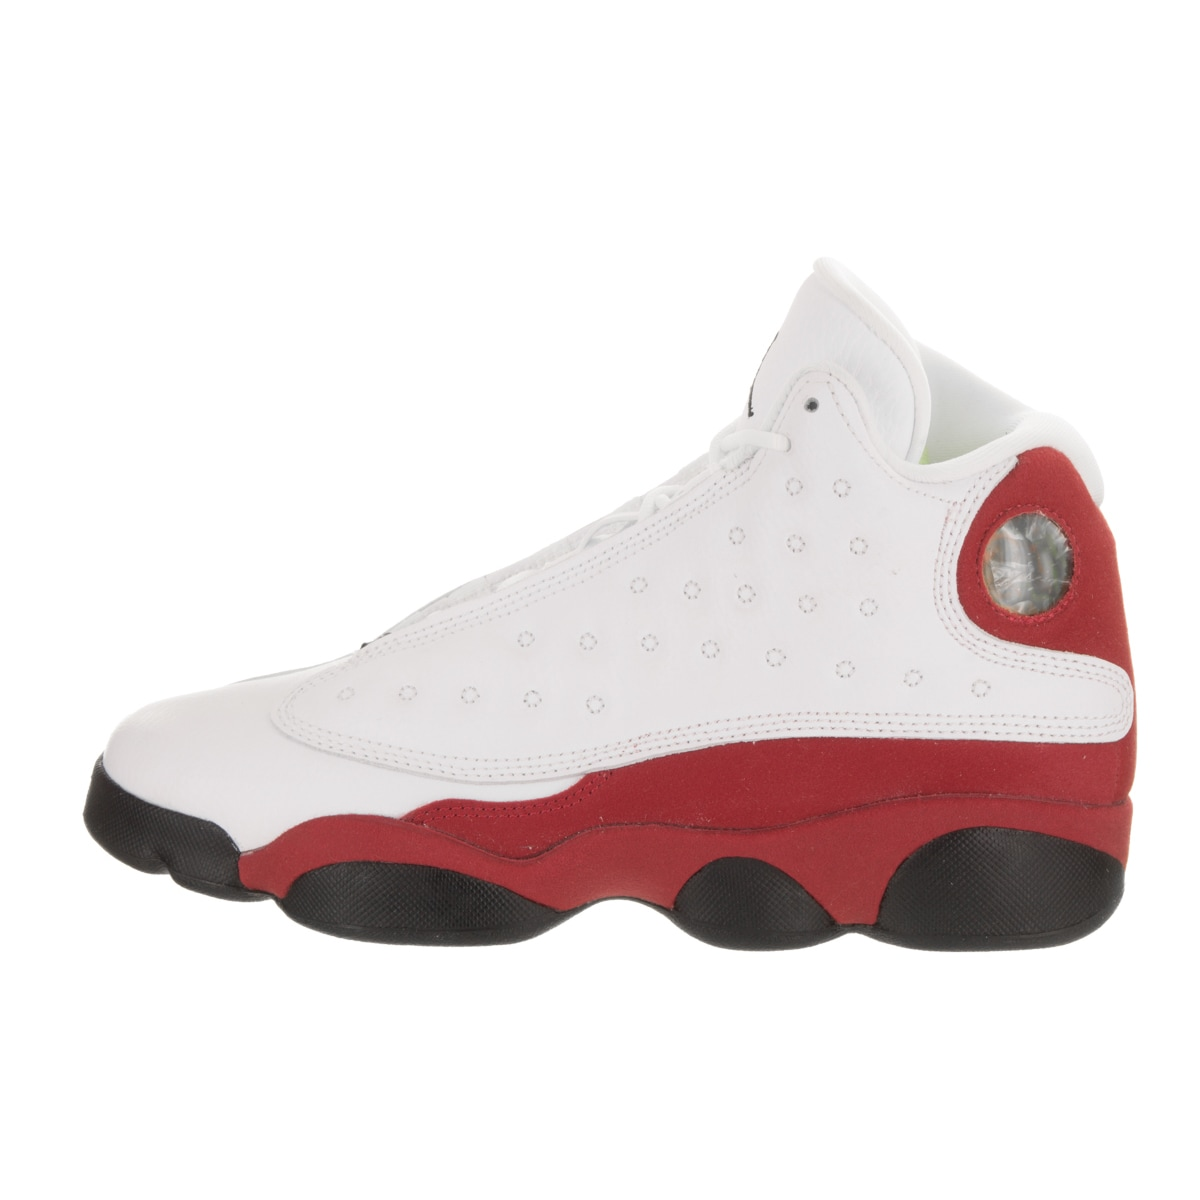 8bc01a6b618 Shop Nike Jordan Kids Air Jordan 13 Retro BG Basketball Shoe - Free  Shipping Today - Overstock - 15616837